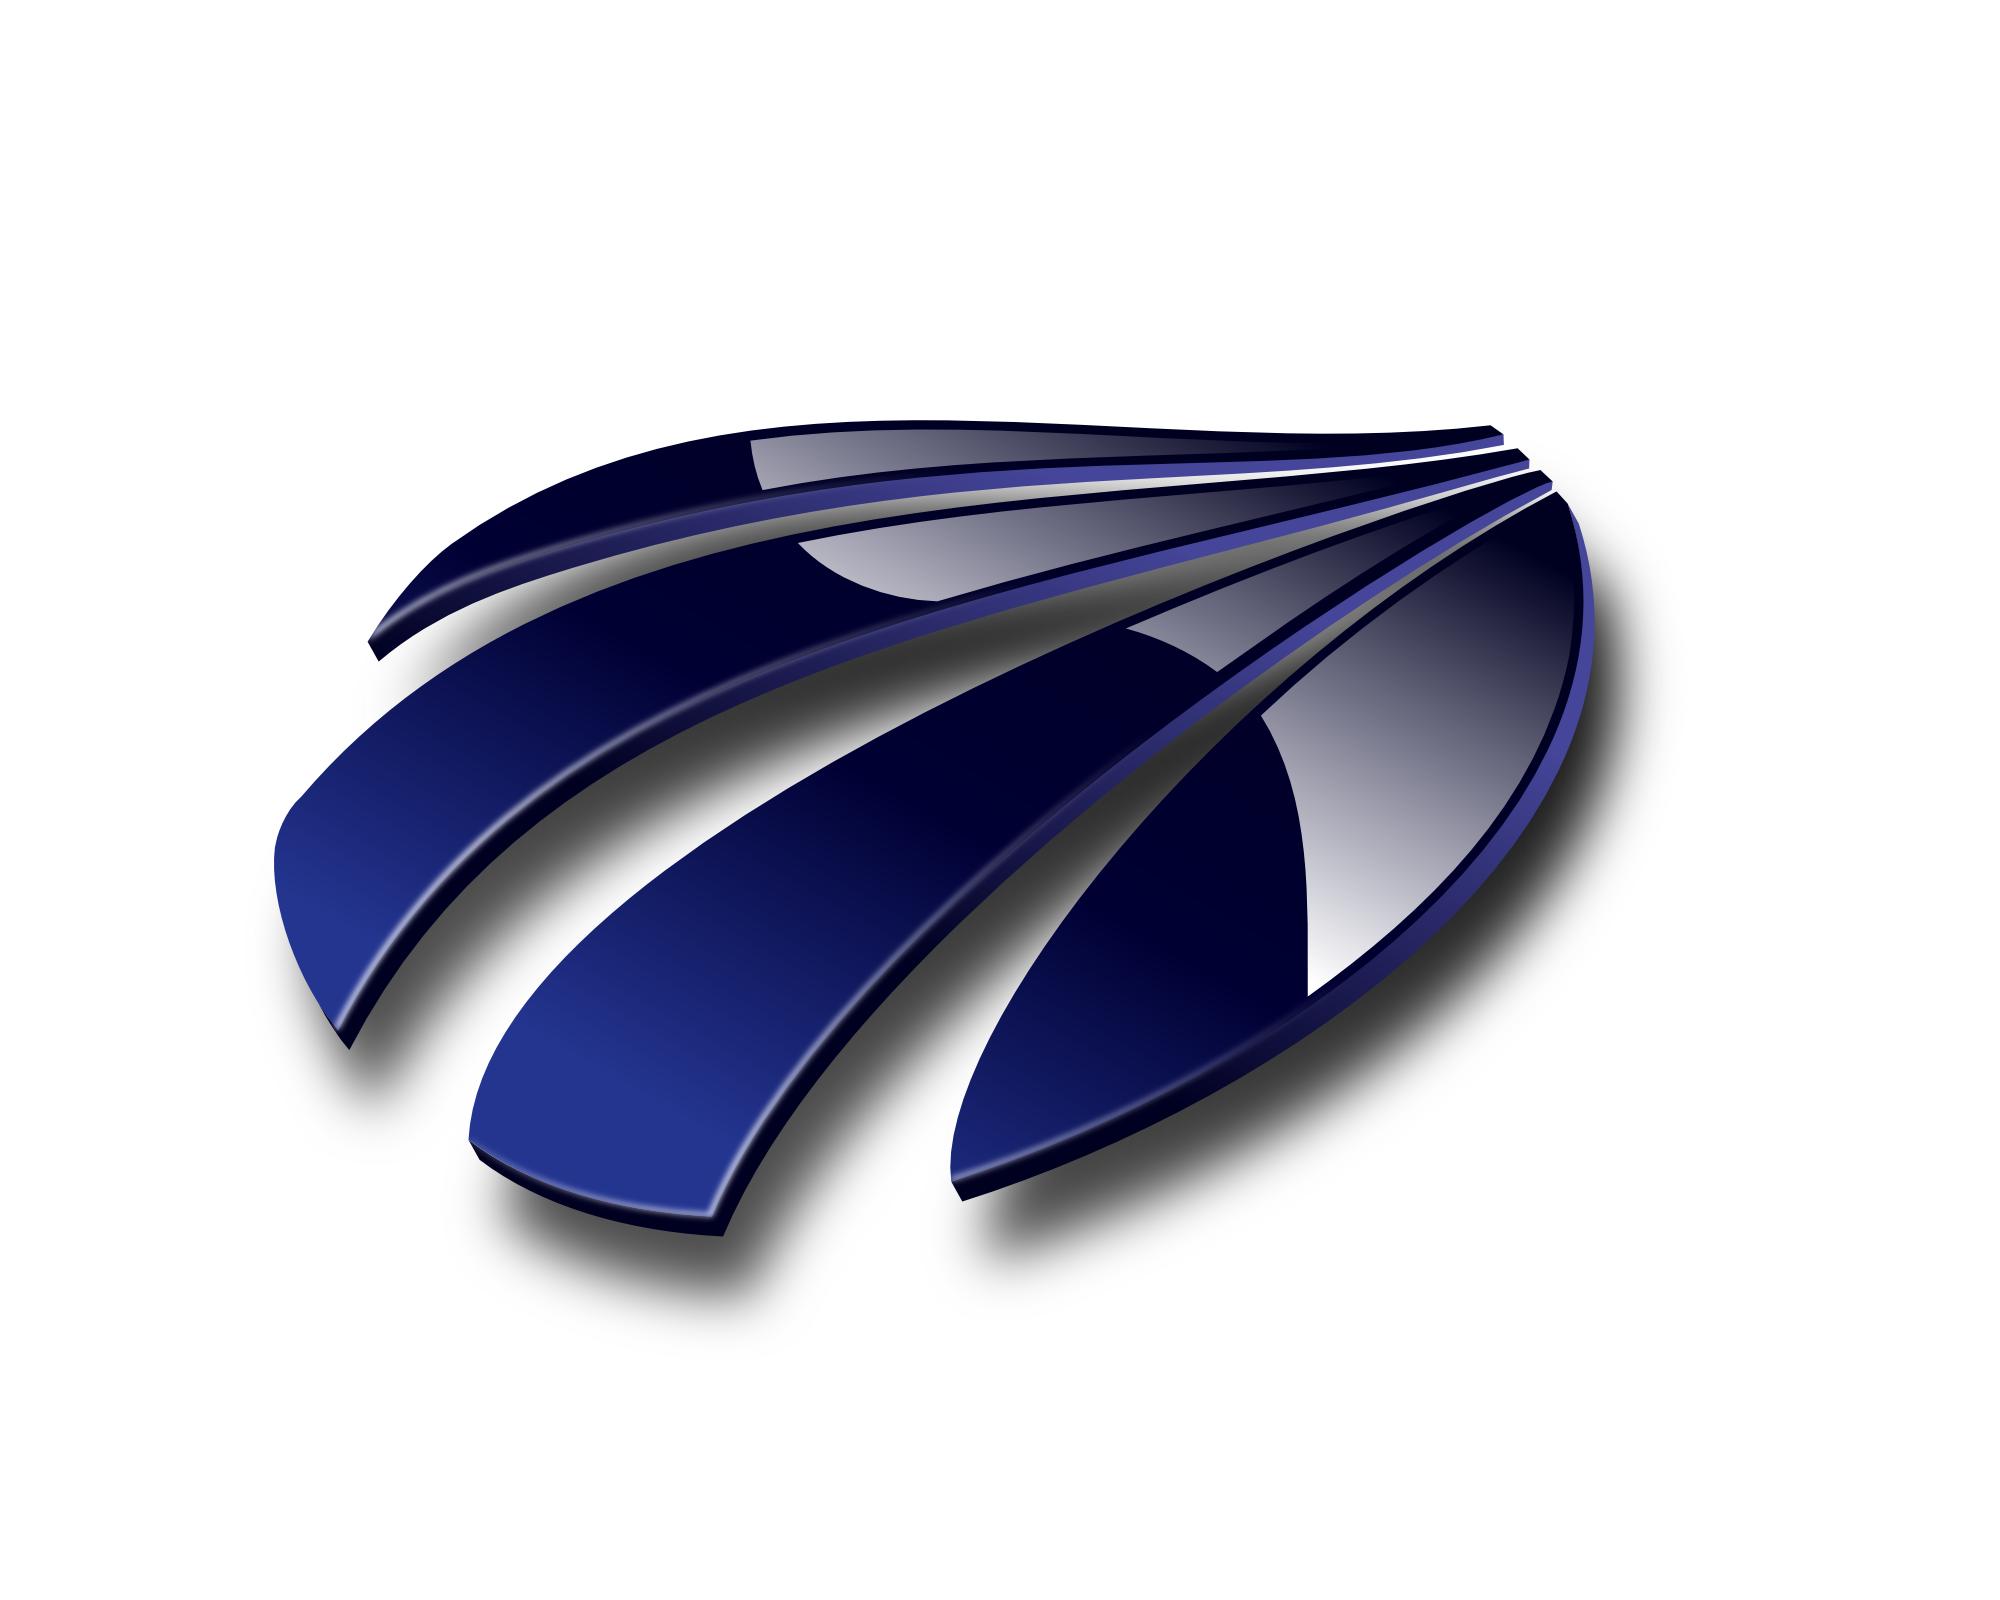 Logo Design by explogos - Entry No. 107 in the Logo Design Contest Artistic Logo Design for Louie Strategic Systems Consulting.